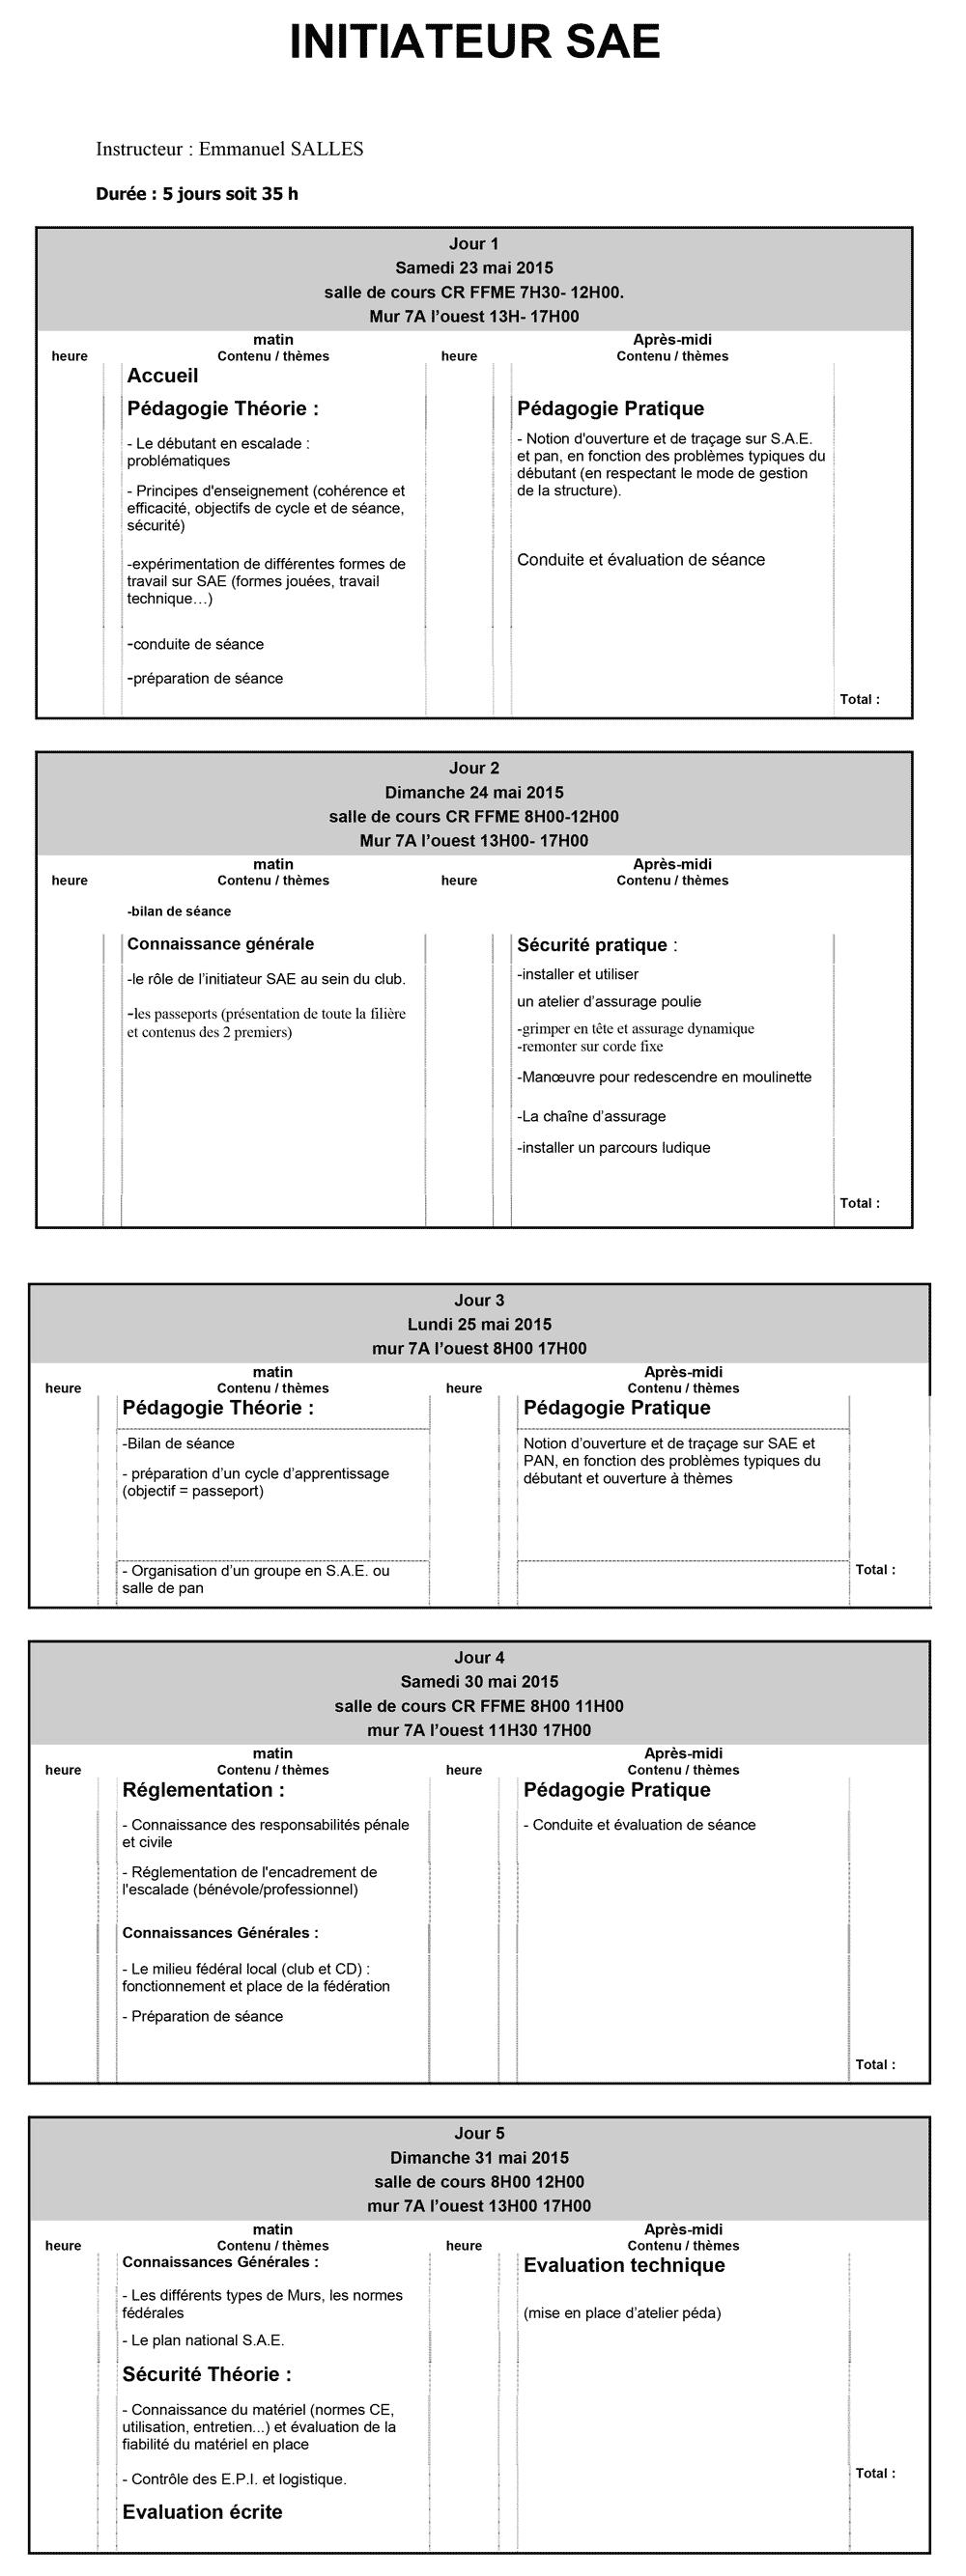 Planning SAE initiateur mai 2015